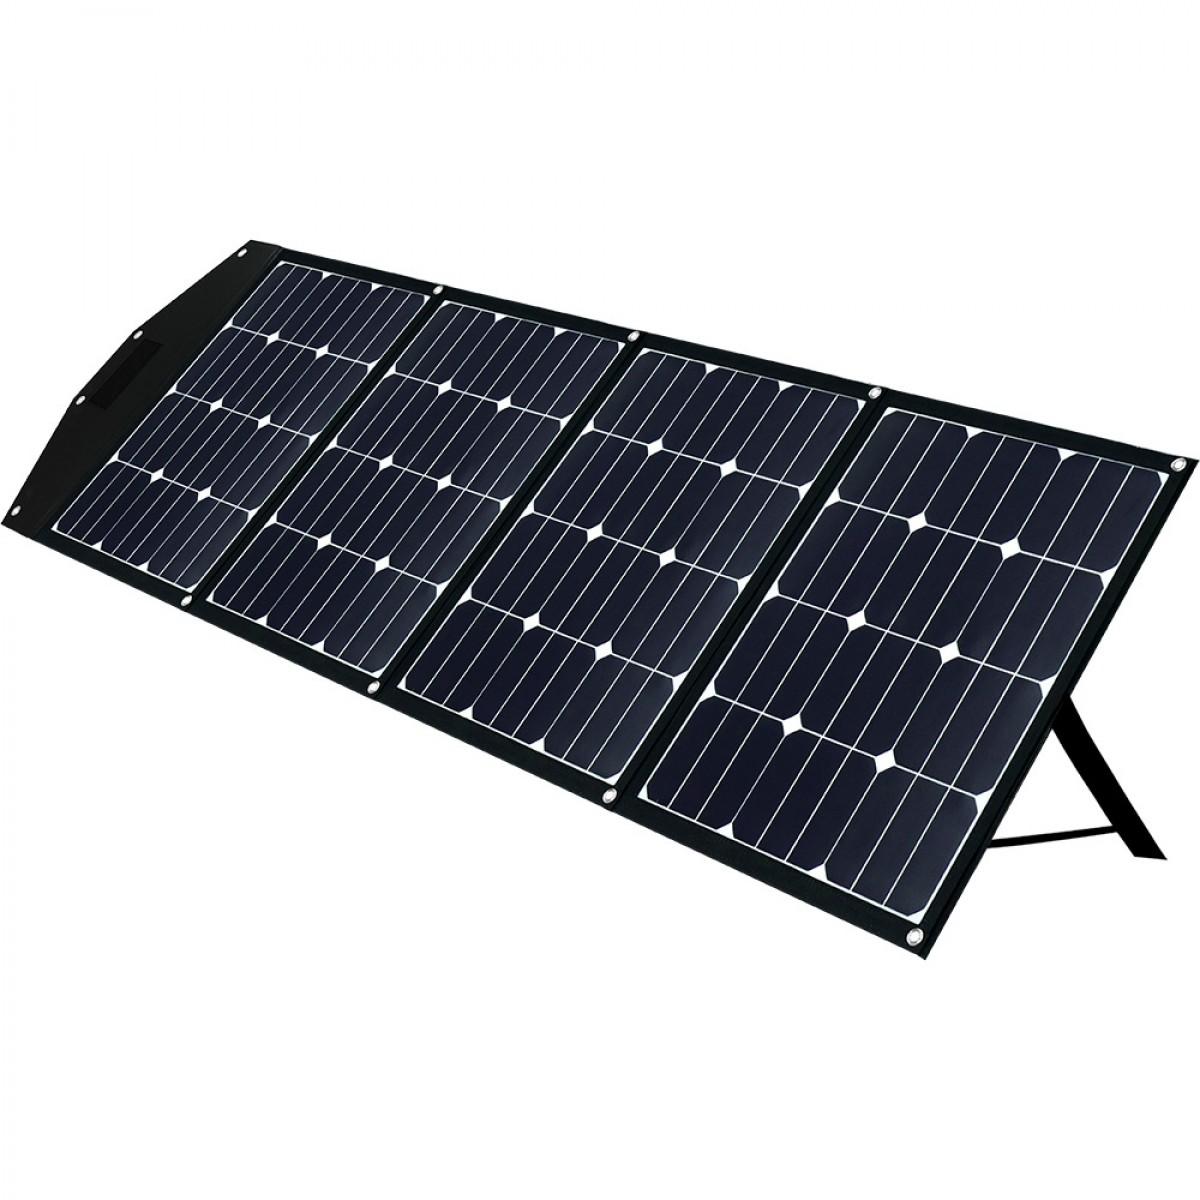 Faltmodul 4x40Wp mit MPPT Solarladeregler 2